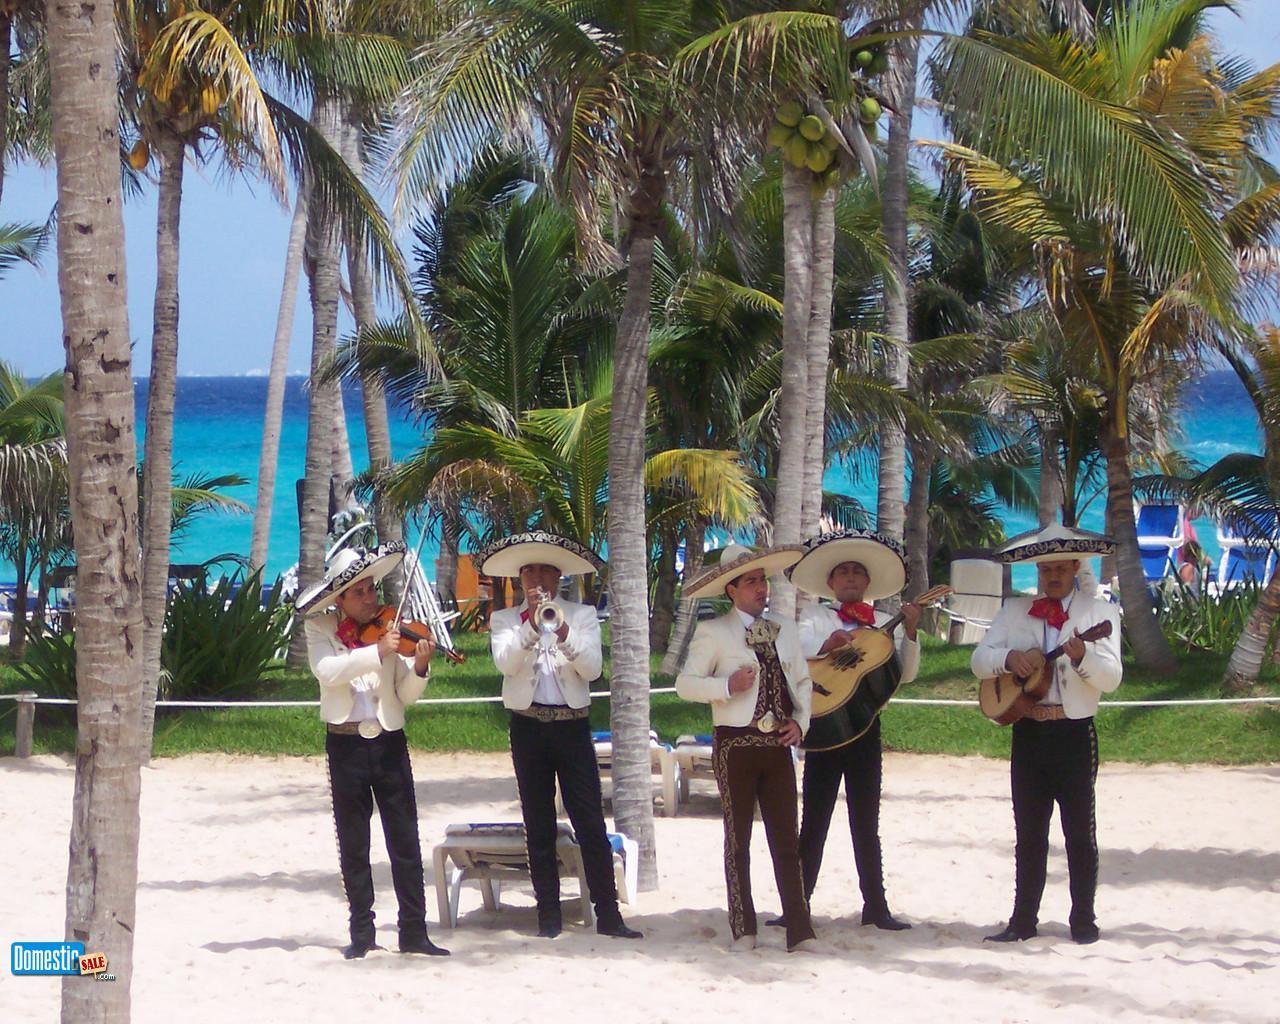 Mexico band